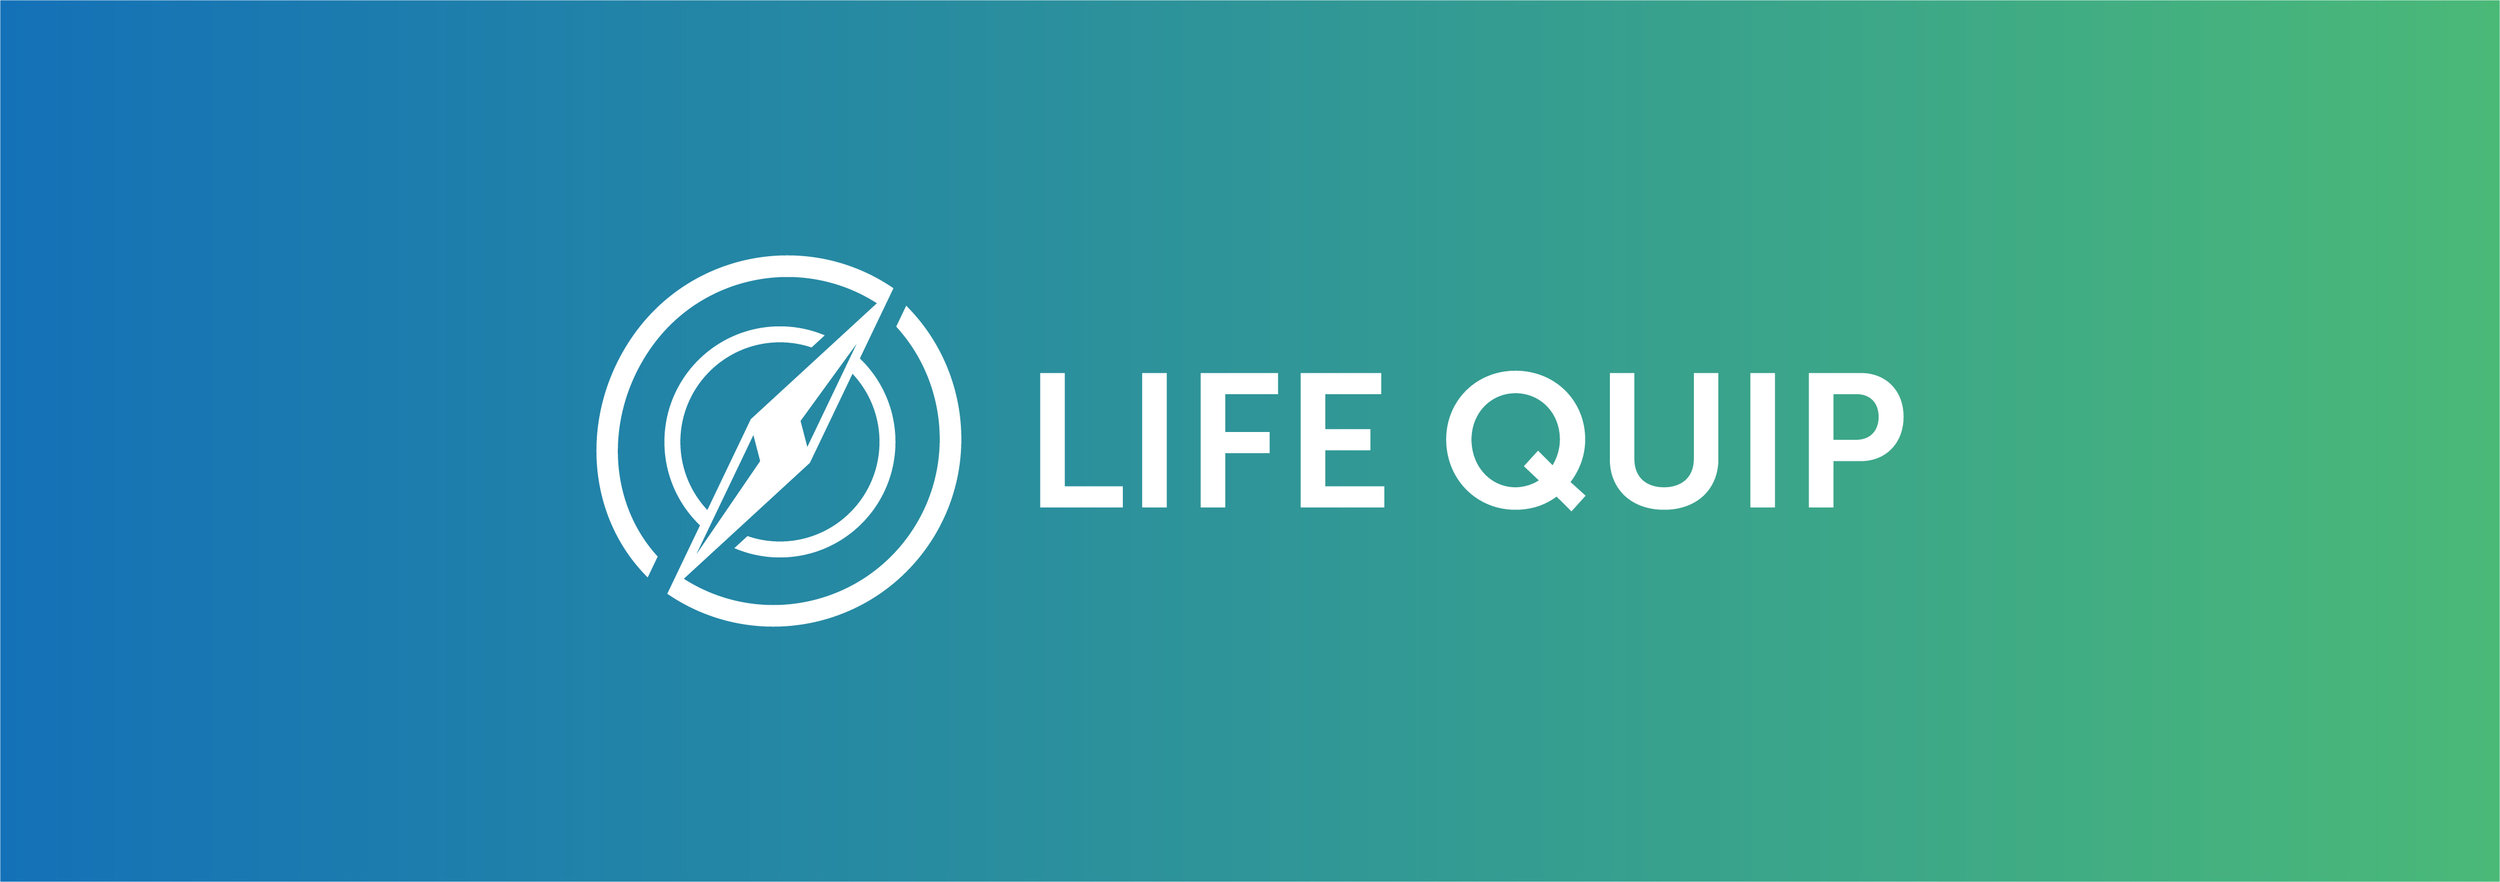 lifequip.jpg